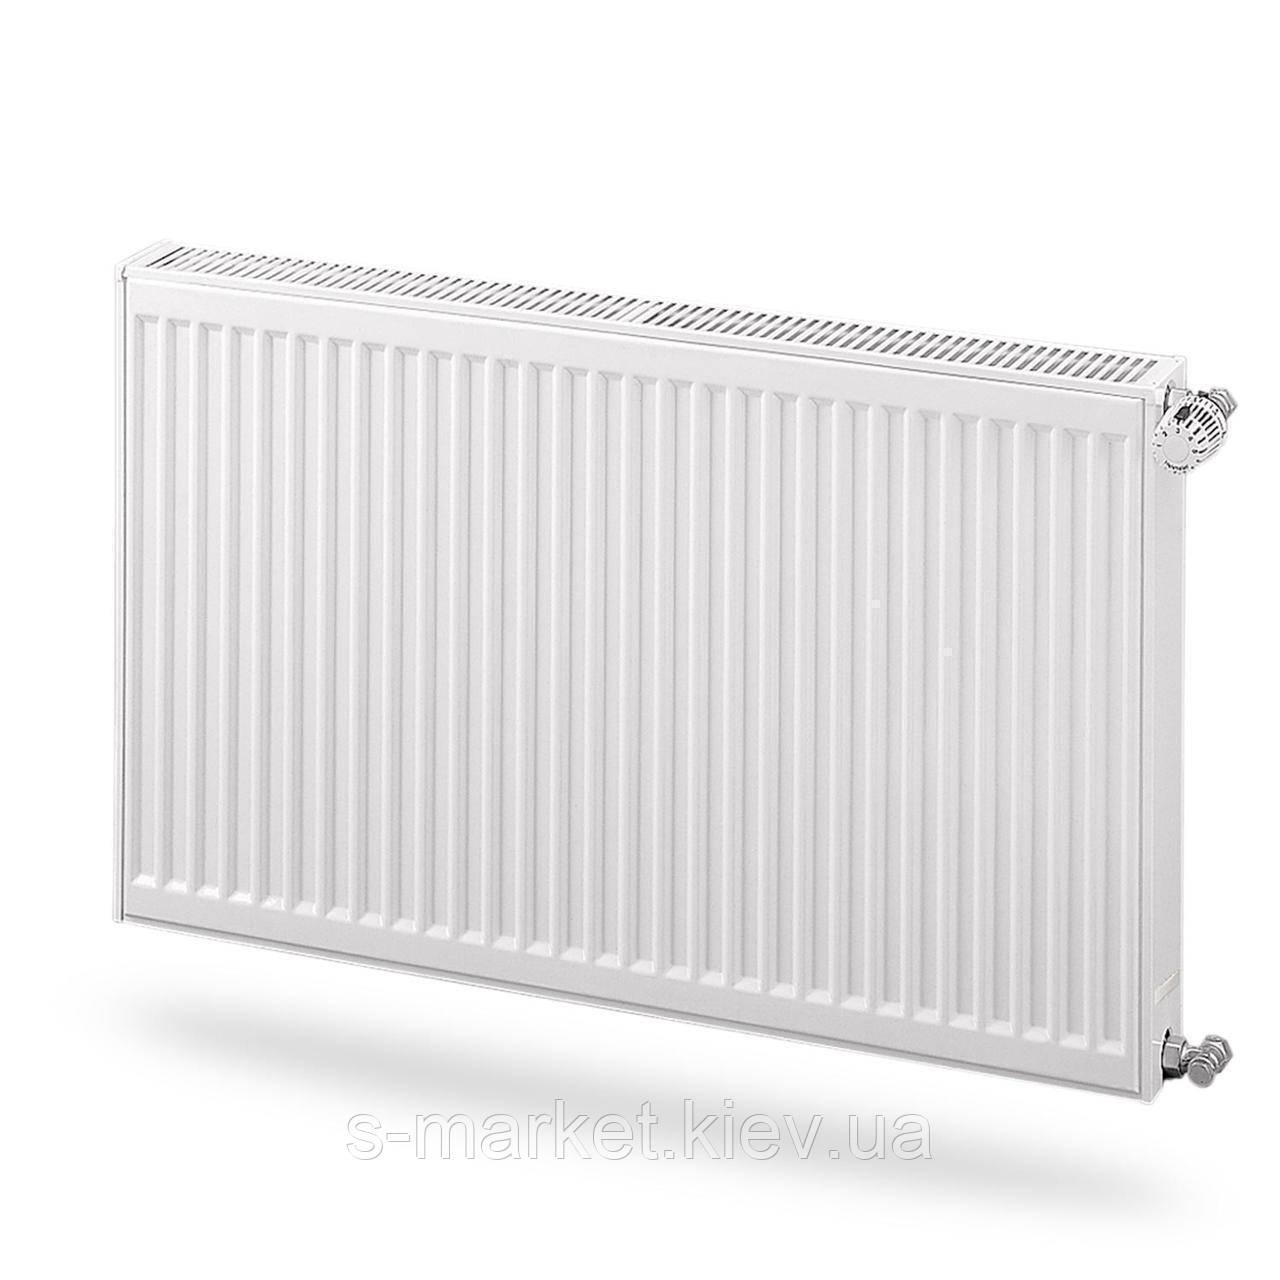 Радиатор Purmo Compact 11 тип 500х900